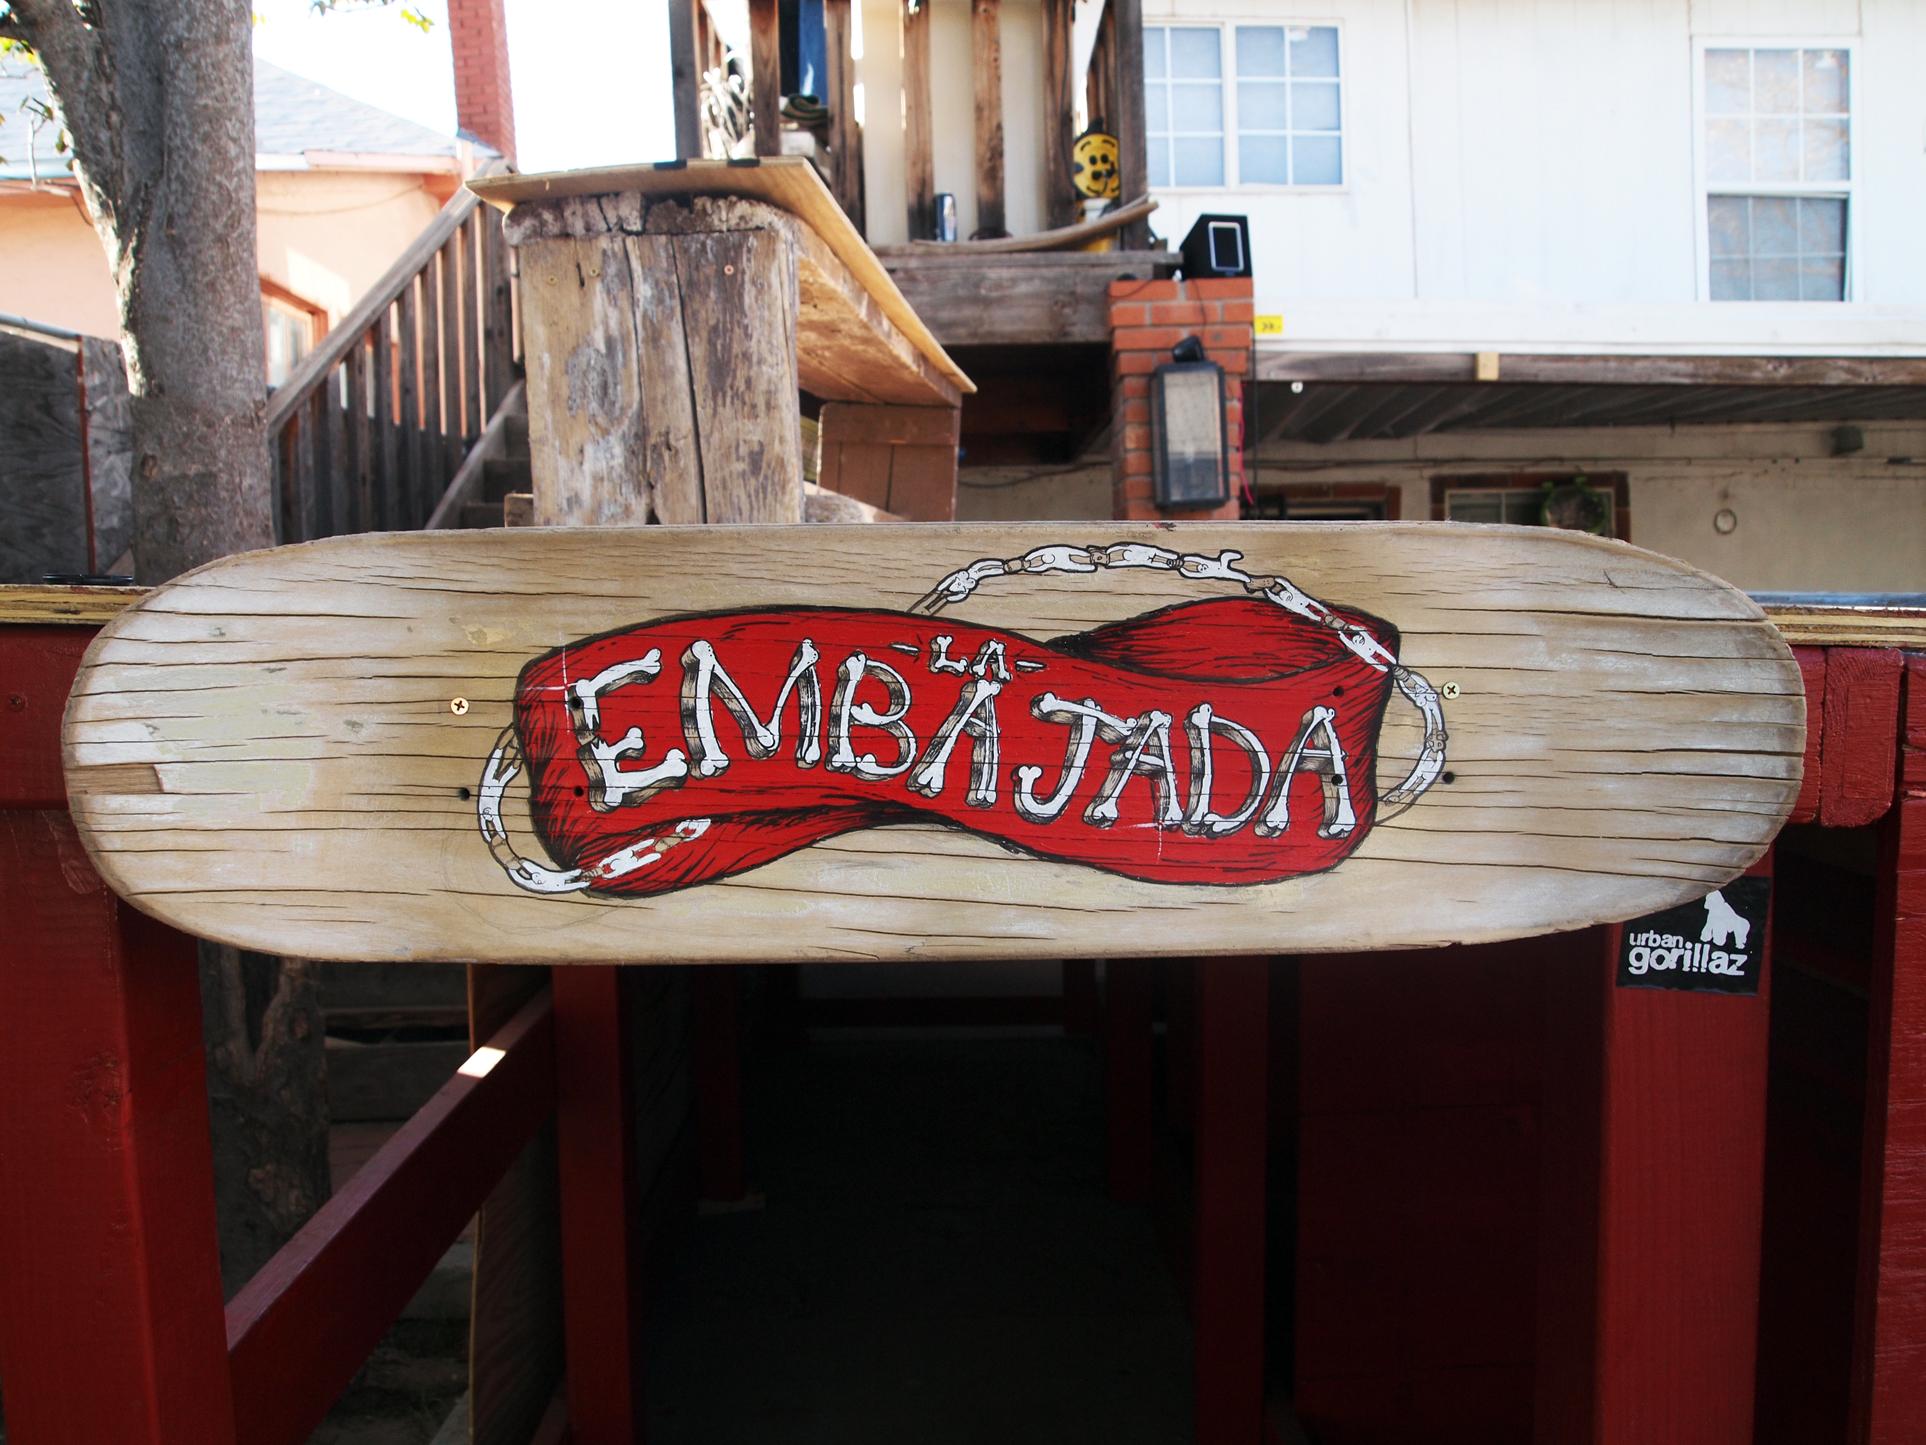 La Embajada - By Kaco (Fifty Foot Killer)